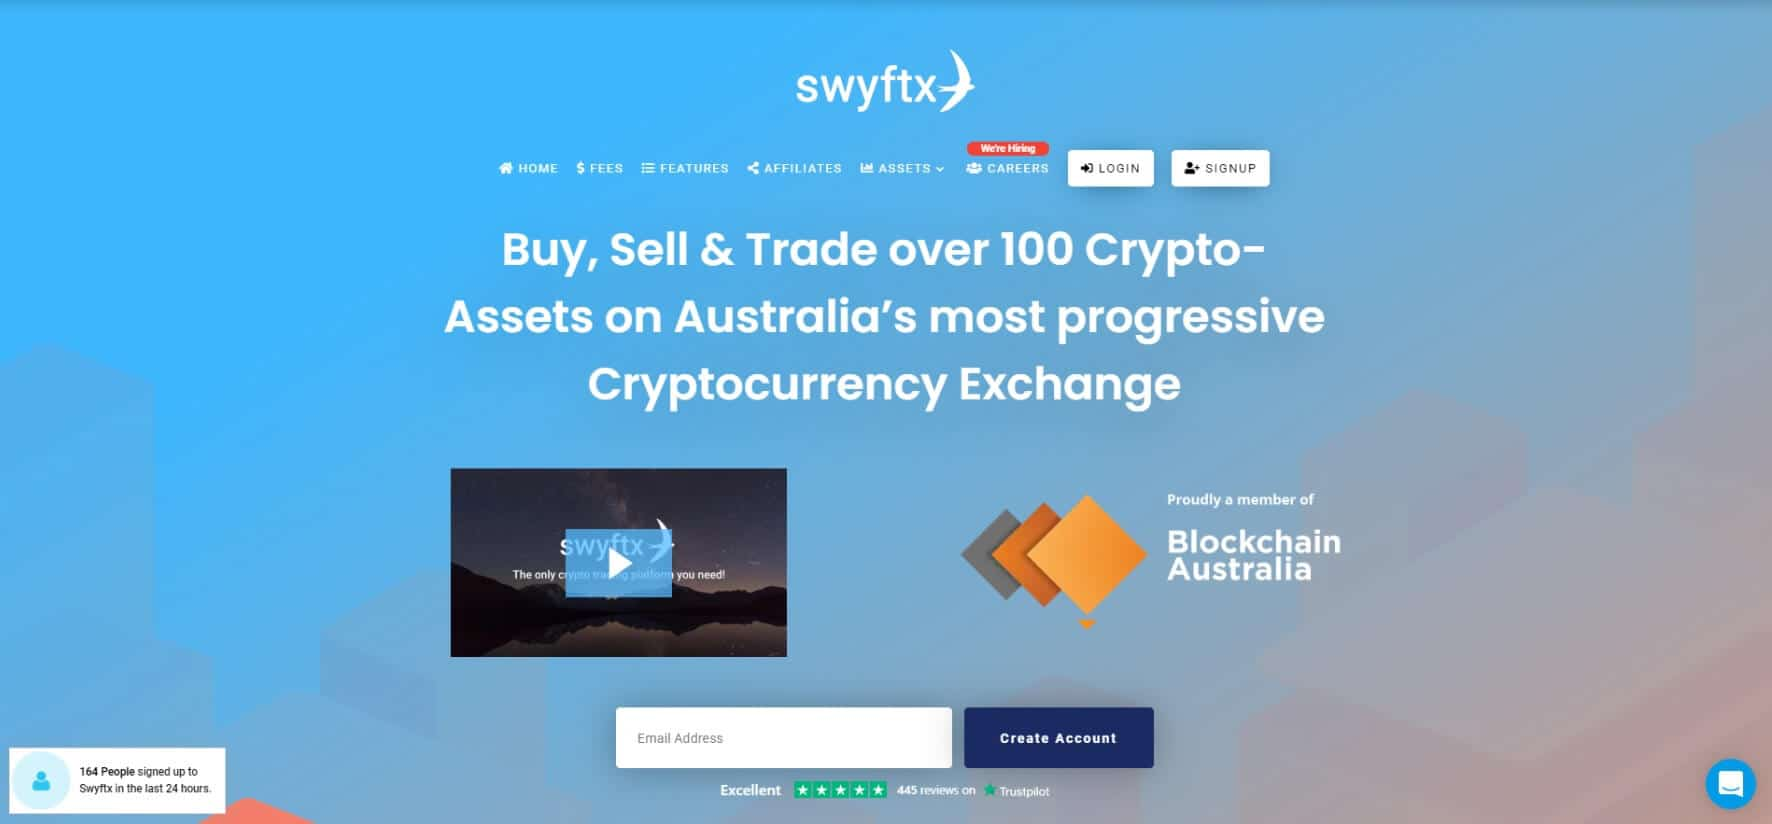 Swyftx Bitcoin Trading Platform